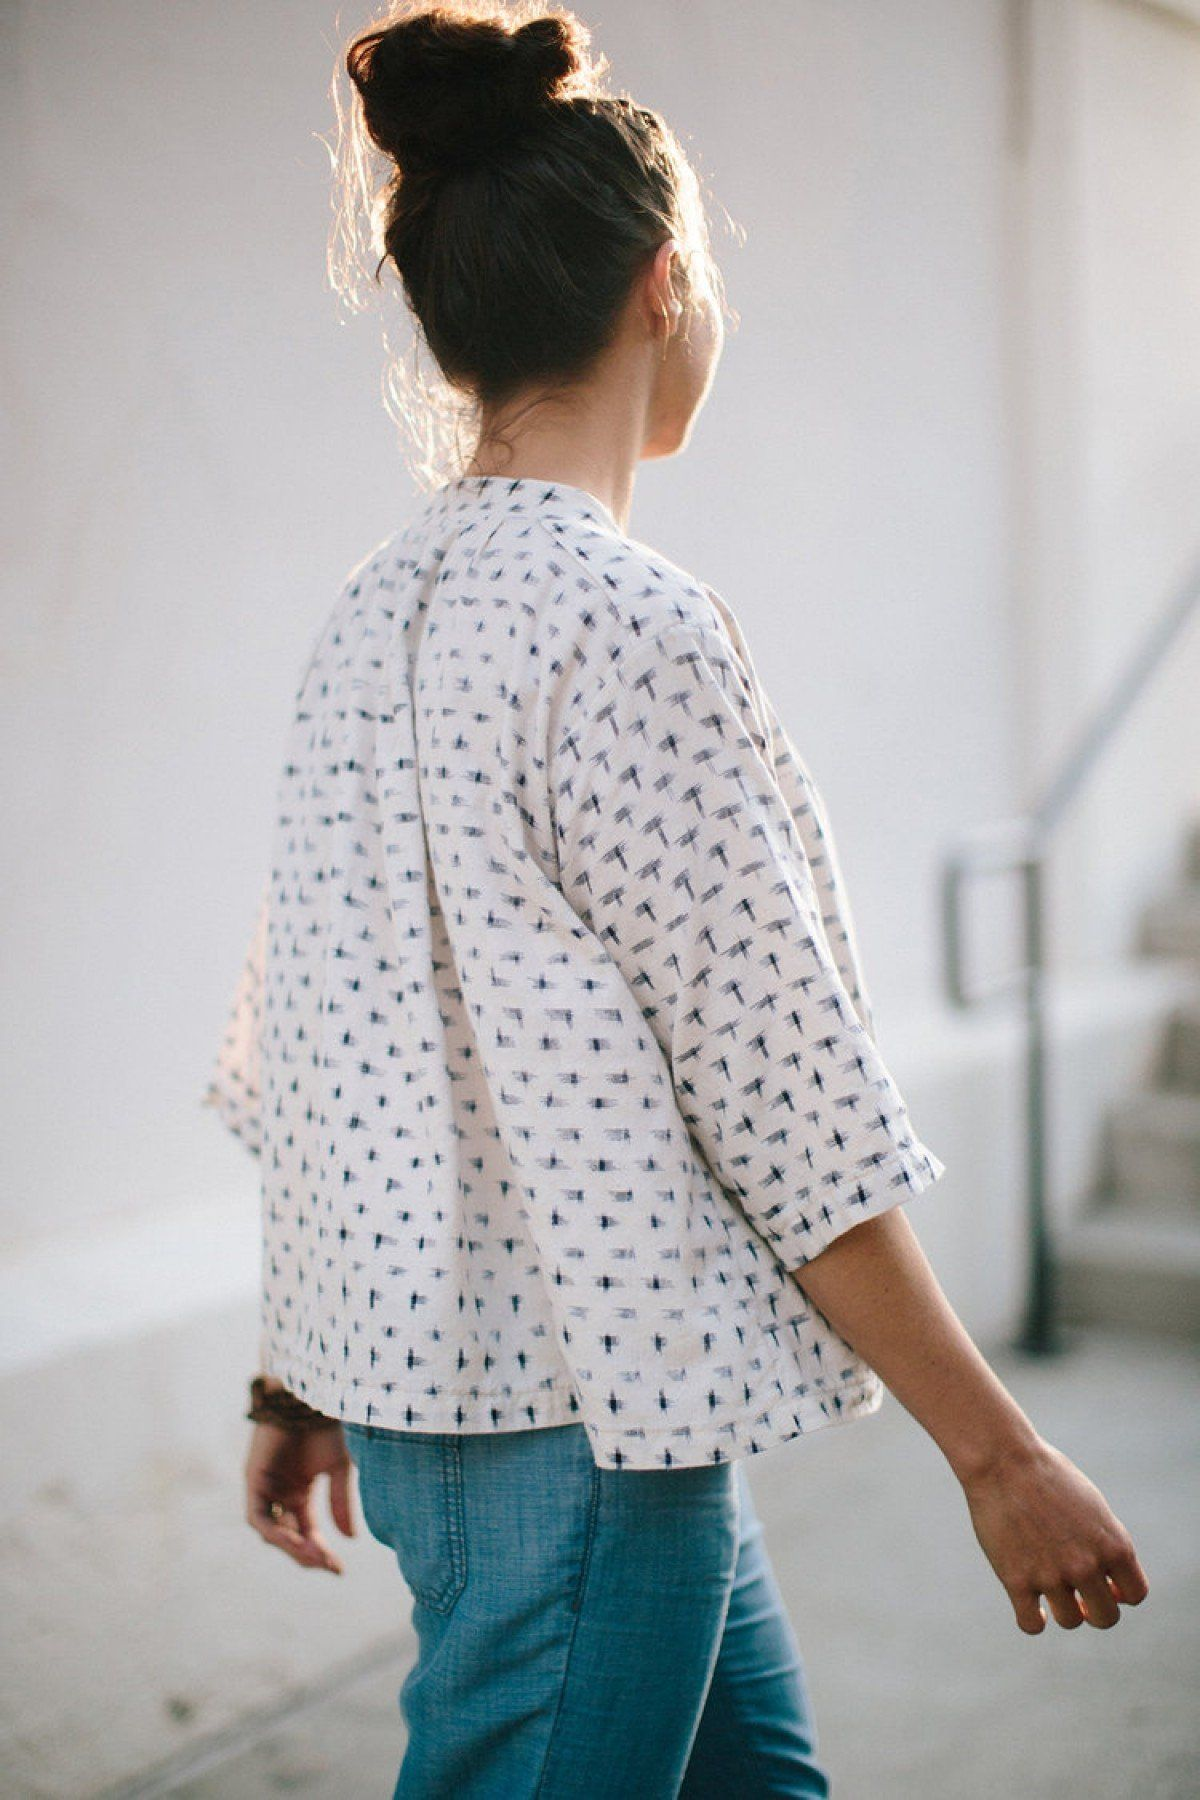 Sew Liberated Patterns Matcha Top Pattern | Patterns to buy ...